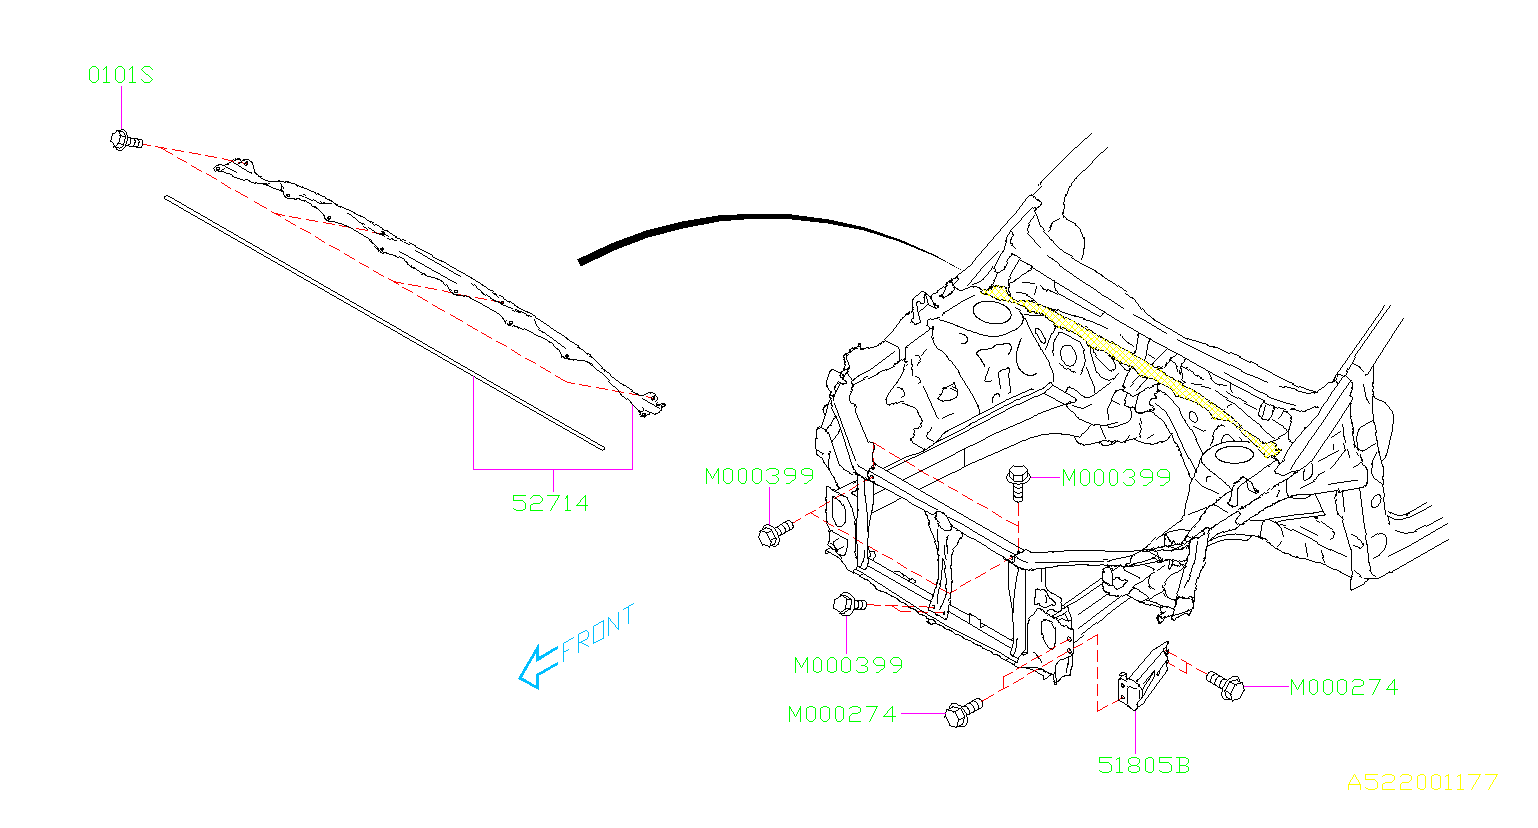 tags: #subaru transmission parts diagram#subaru oem parts#subaru  transmission parts#subaru baja parts diagram#08 subaru impreza parts diagram #subaru engine